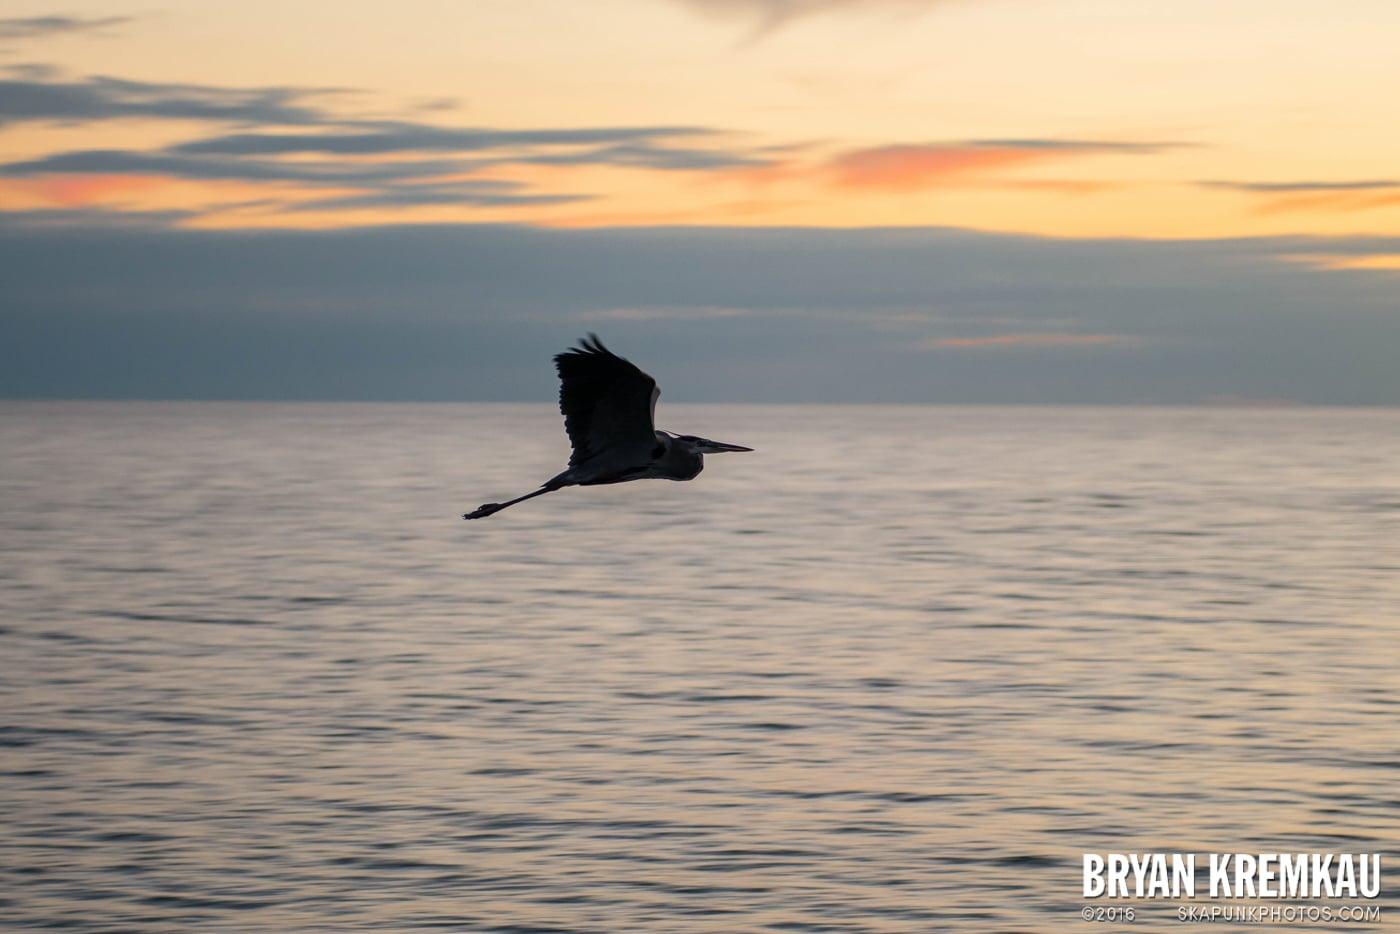 Sunsets, Astrophotography & Birds @ Venice, Florida - 10.25.14 - 11.5.14 (125)